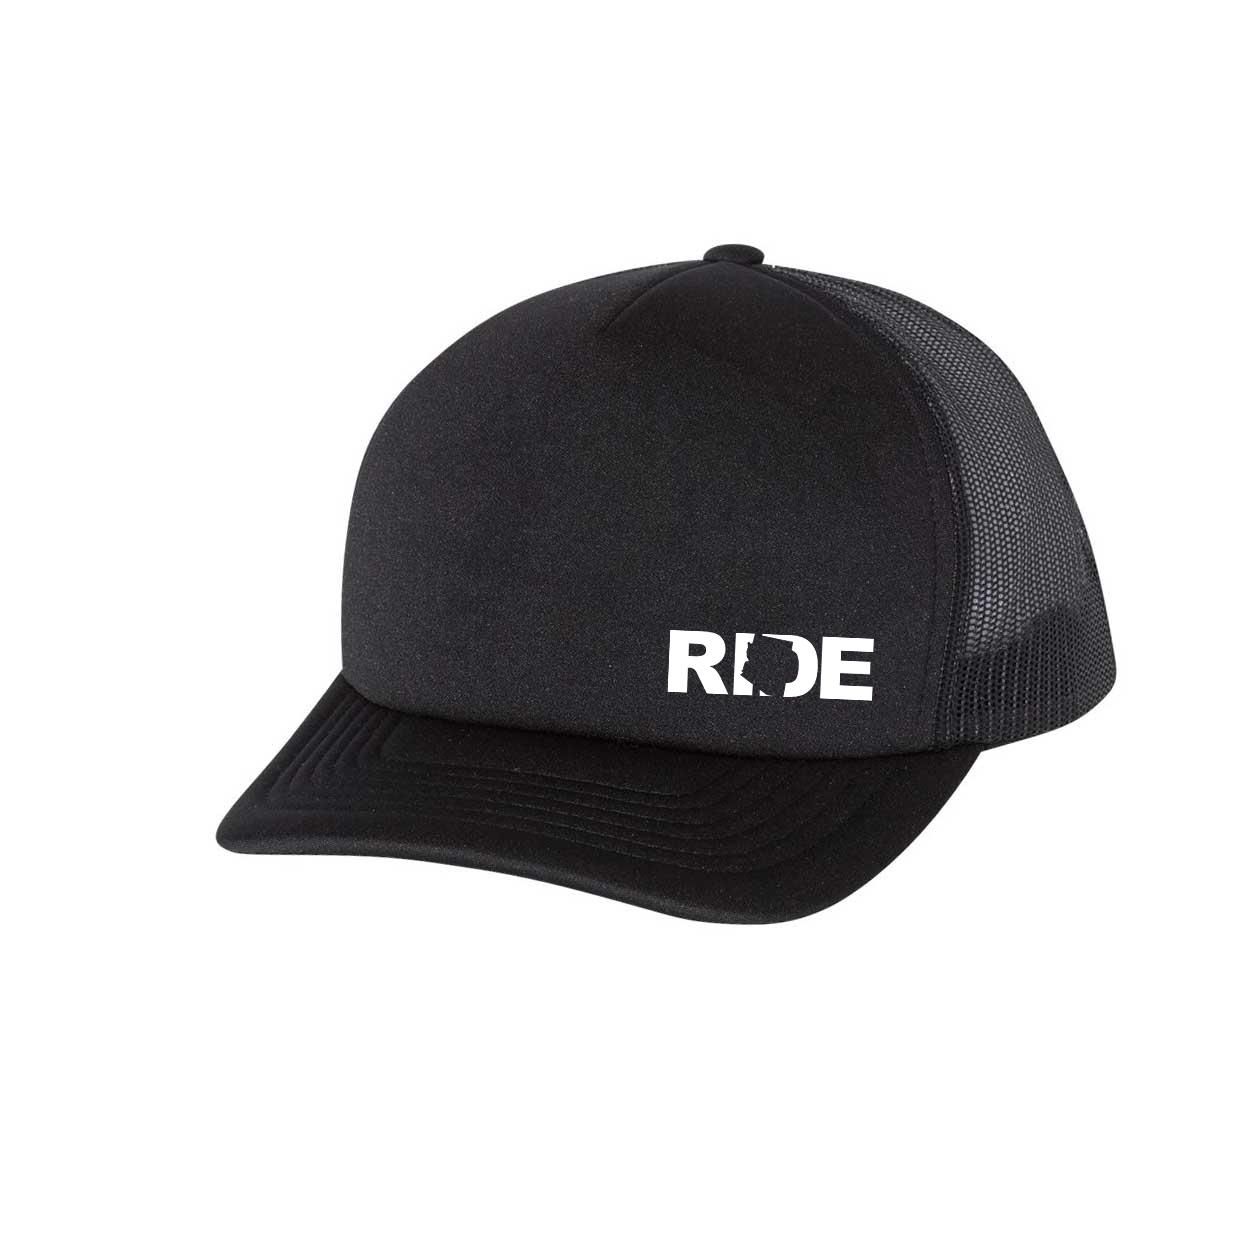 Ride Arizona Night Out Premium Foam Trucker Snapback Hat Black (White Logo)